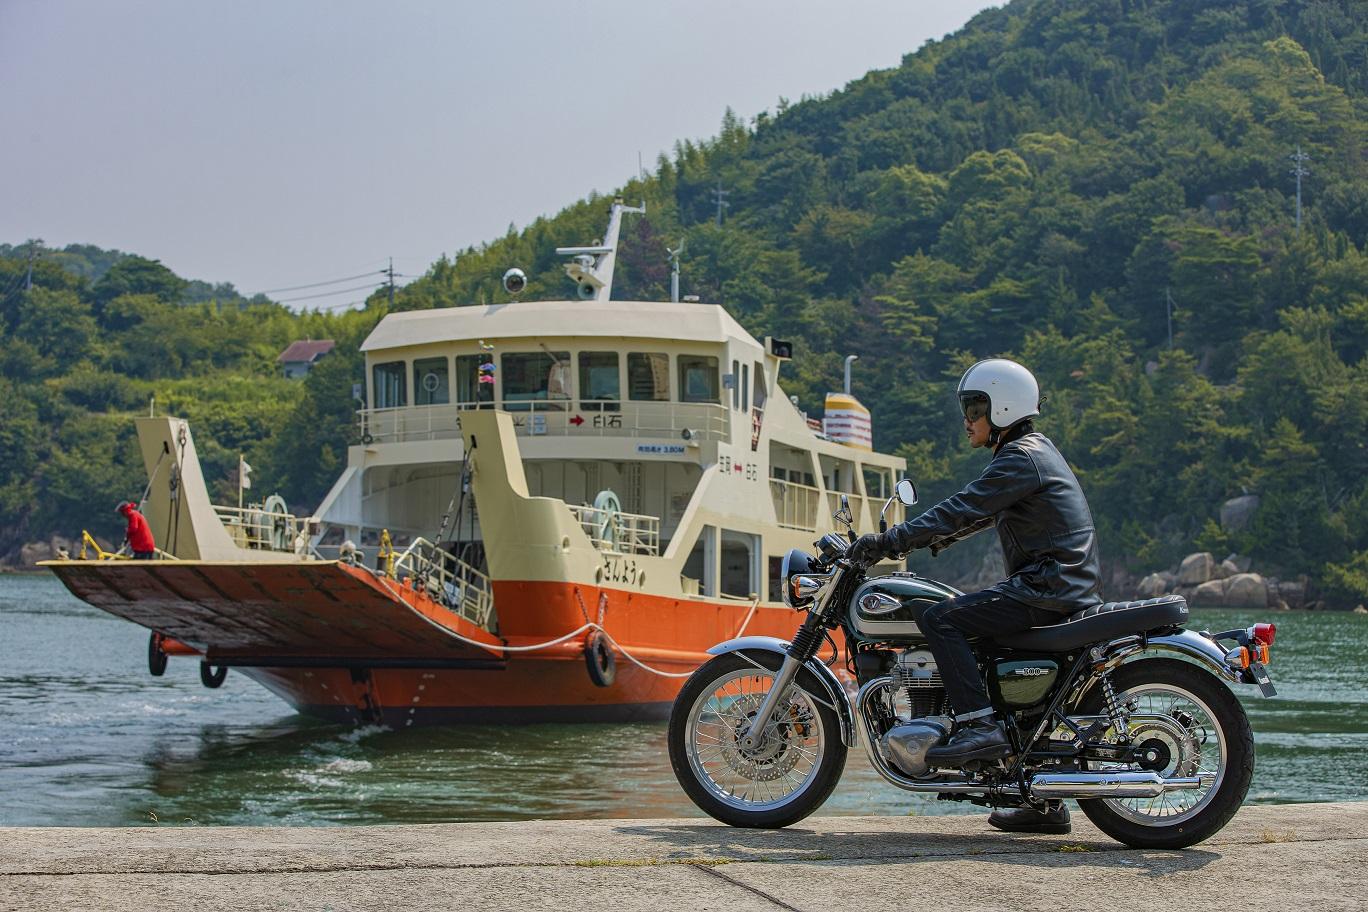 Kawasaki: η σειρά W ολοκληρώνεται με την νέα W800!